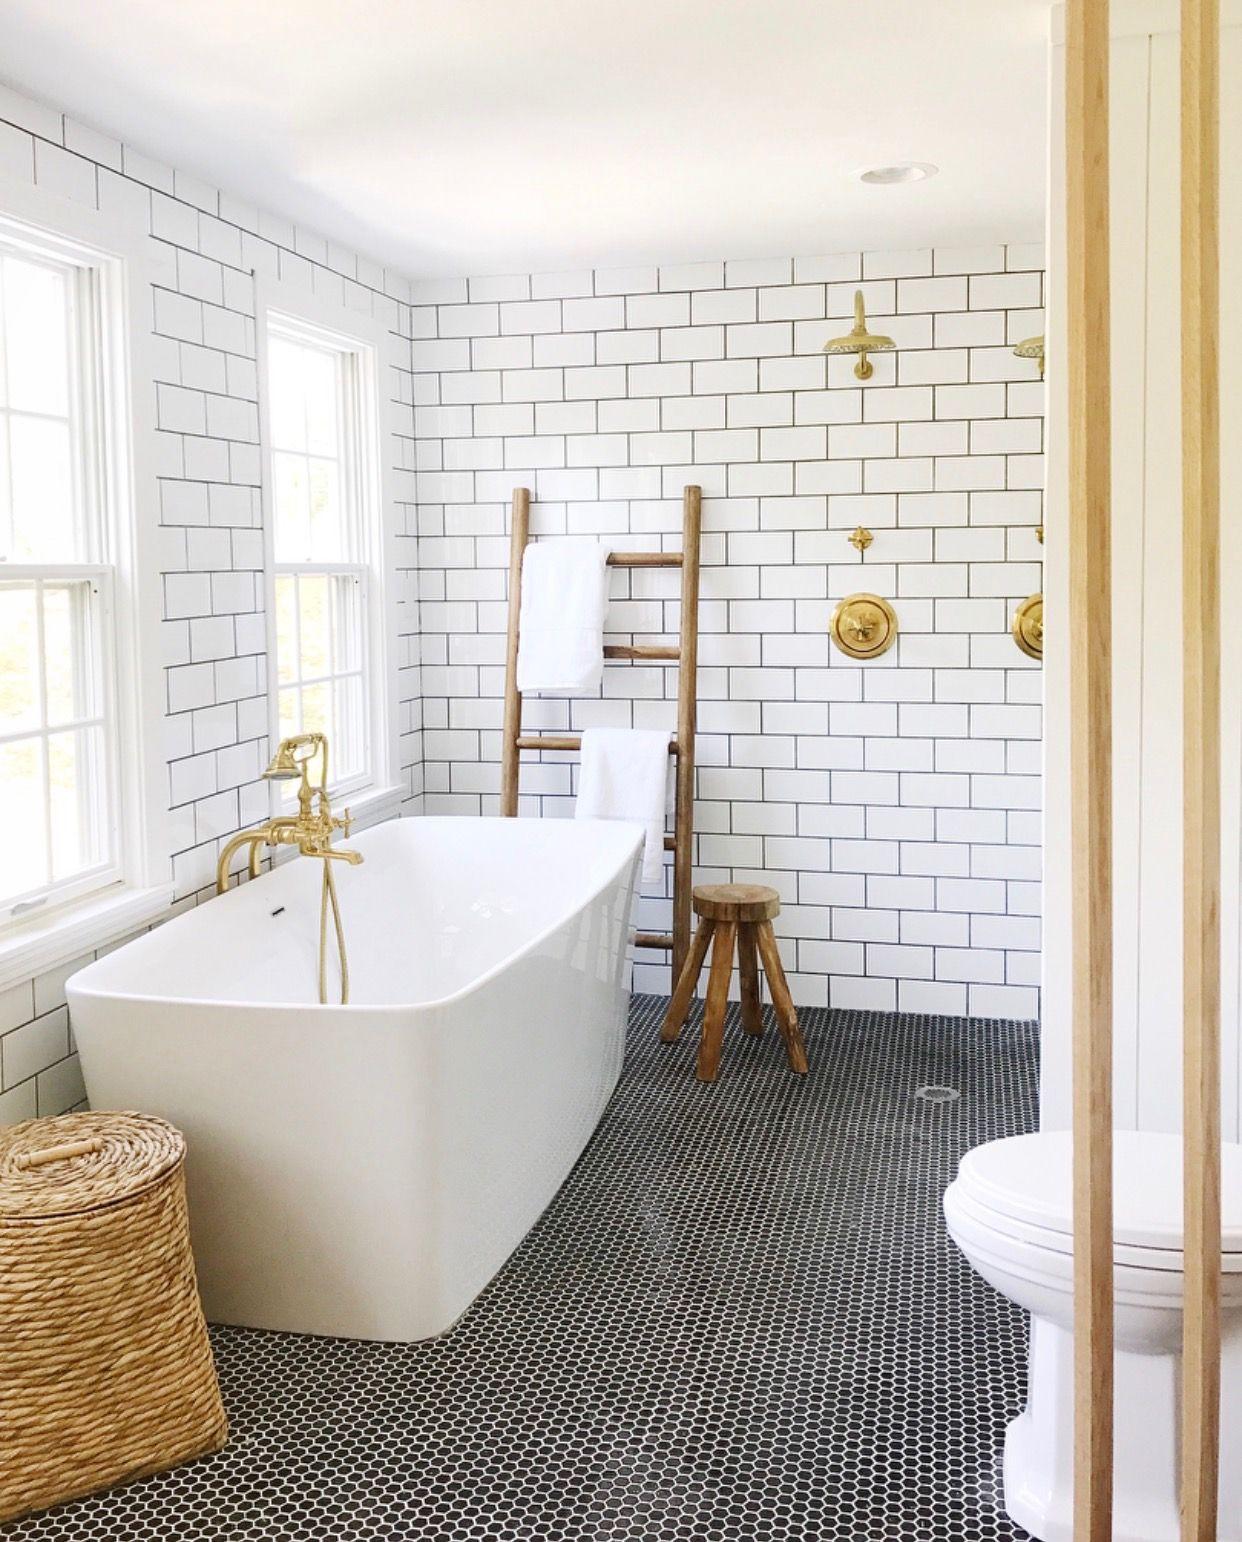 white subway tile + black penny floors | Bathrooms | Pinterest ...